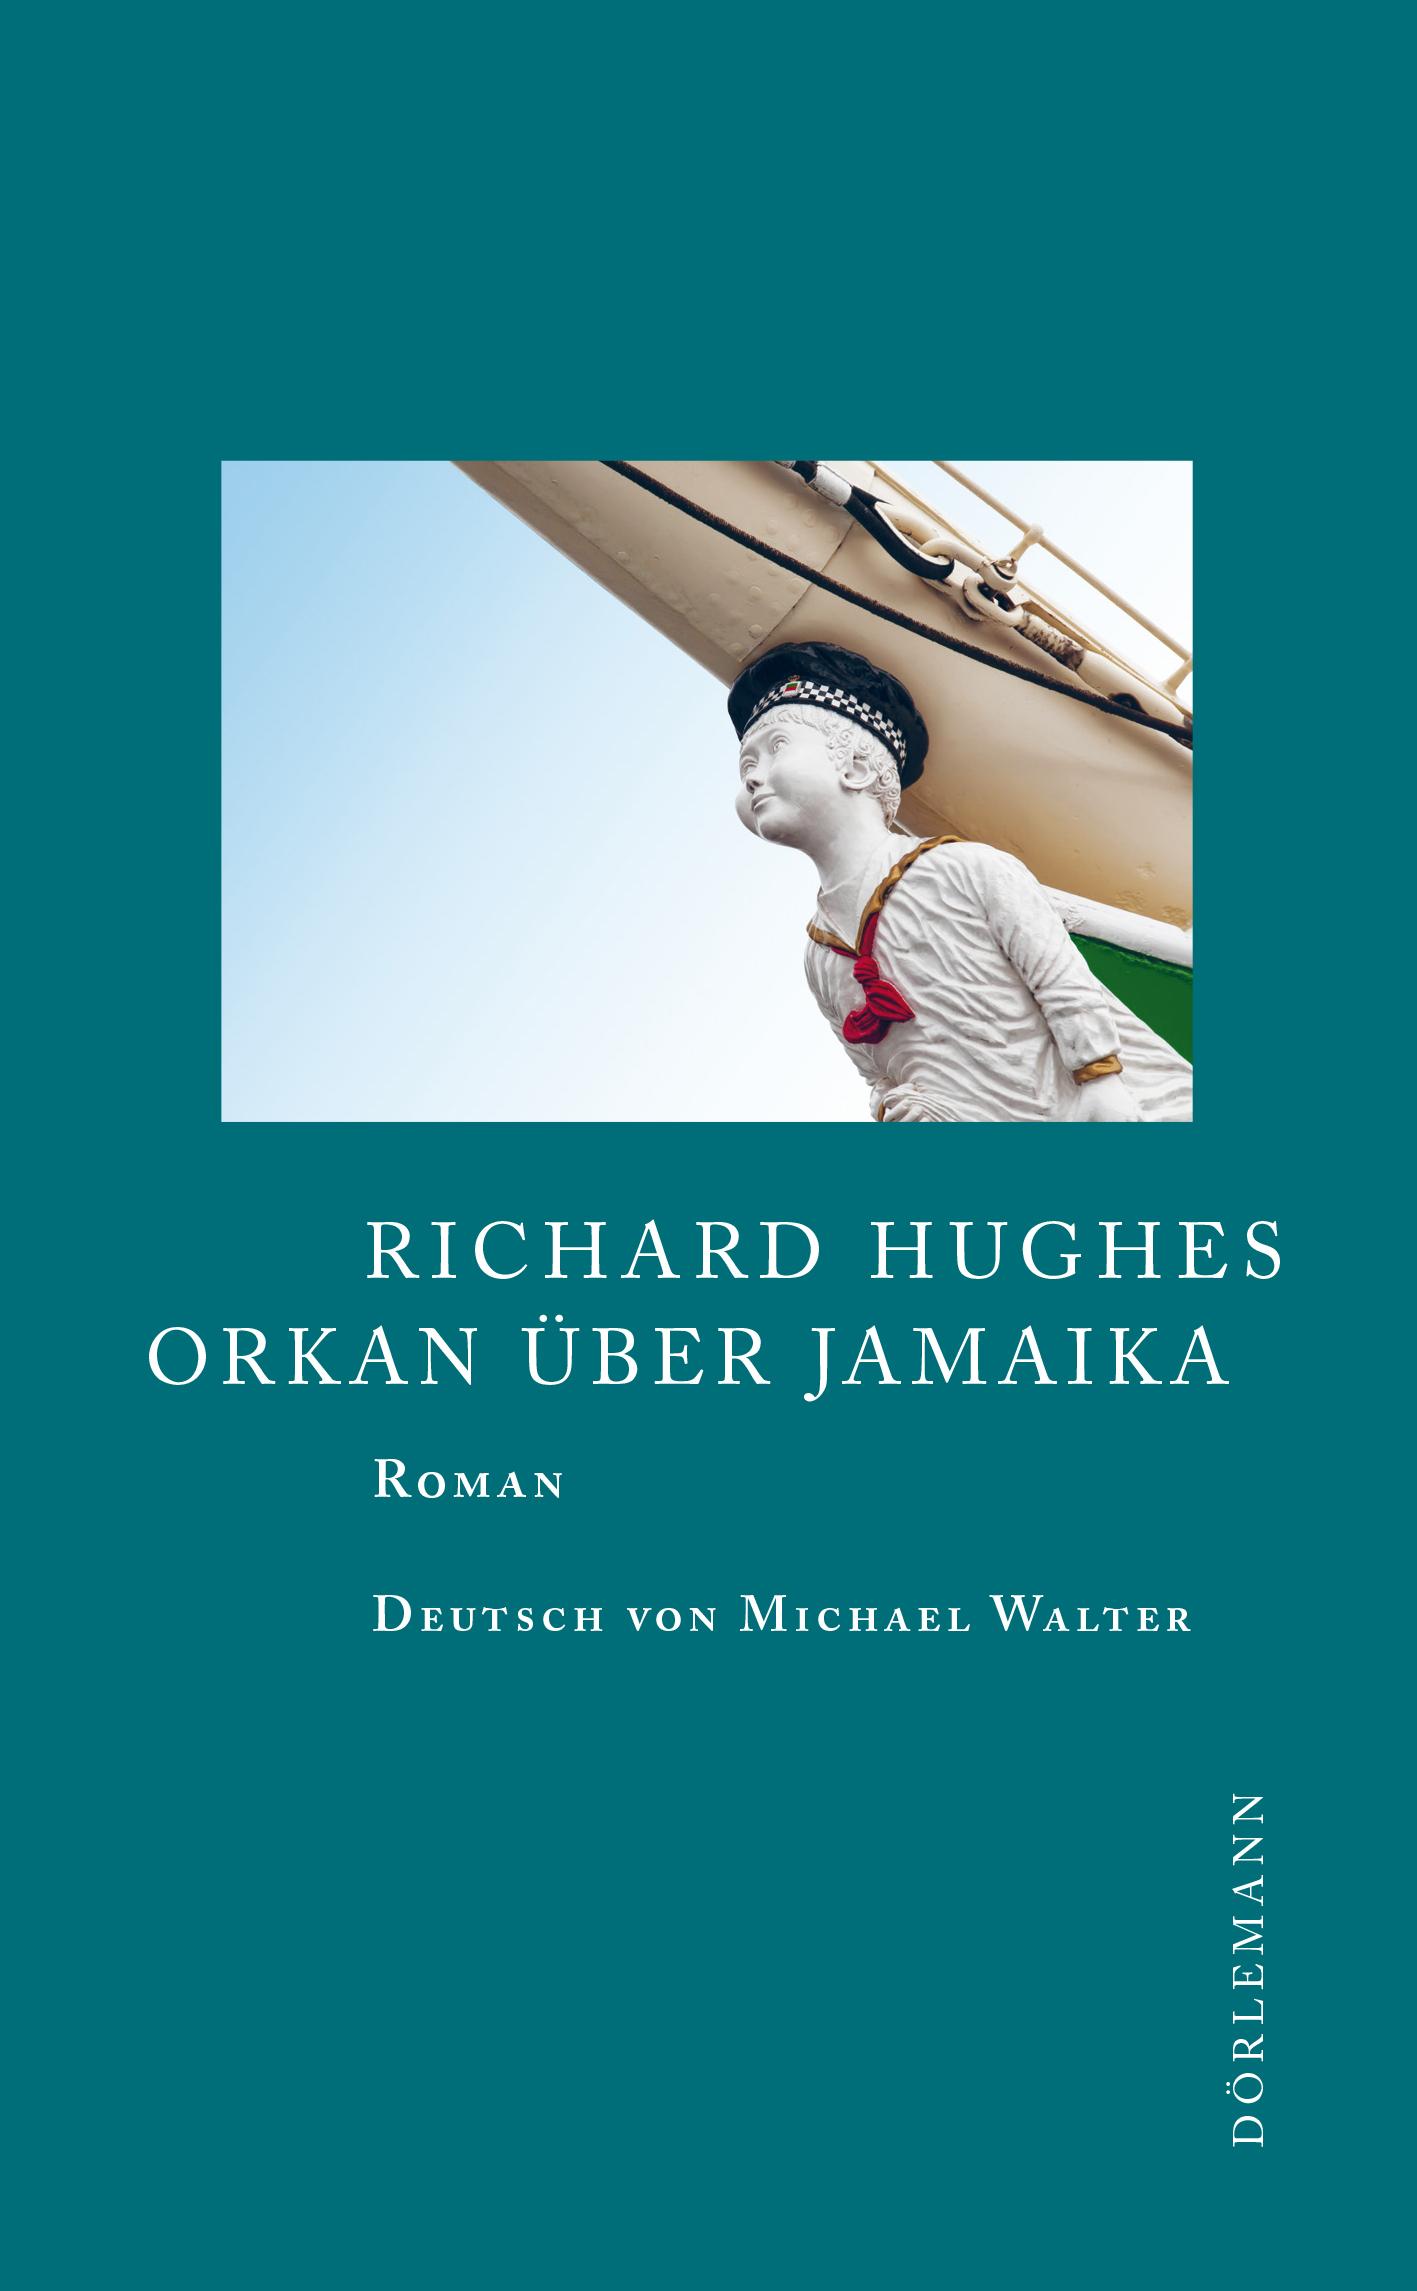 Orkan über Jamaika by Richard Hughes